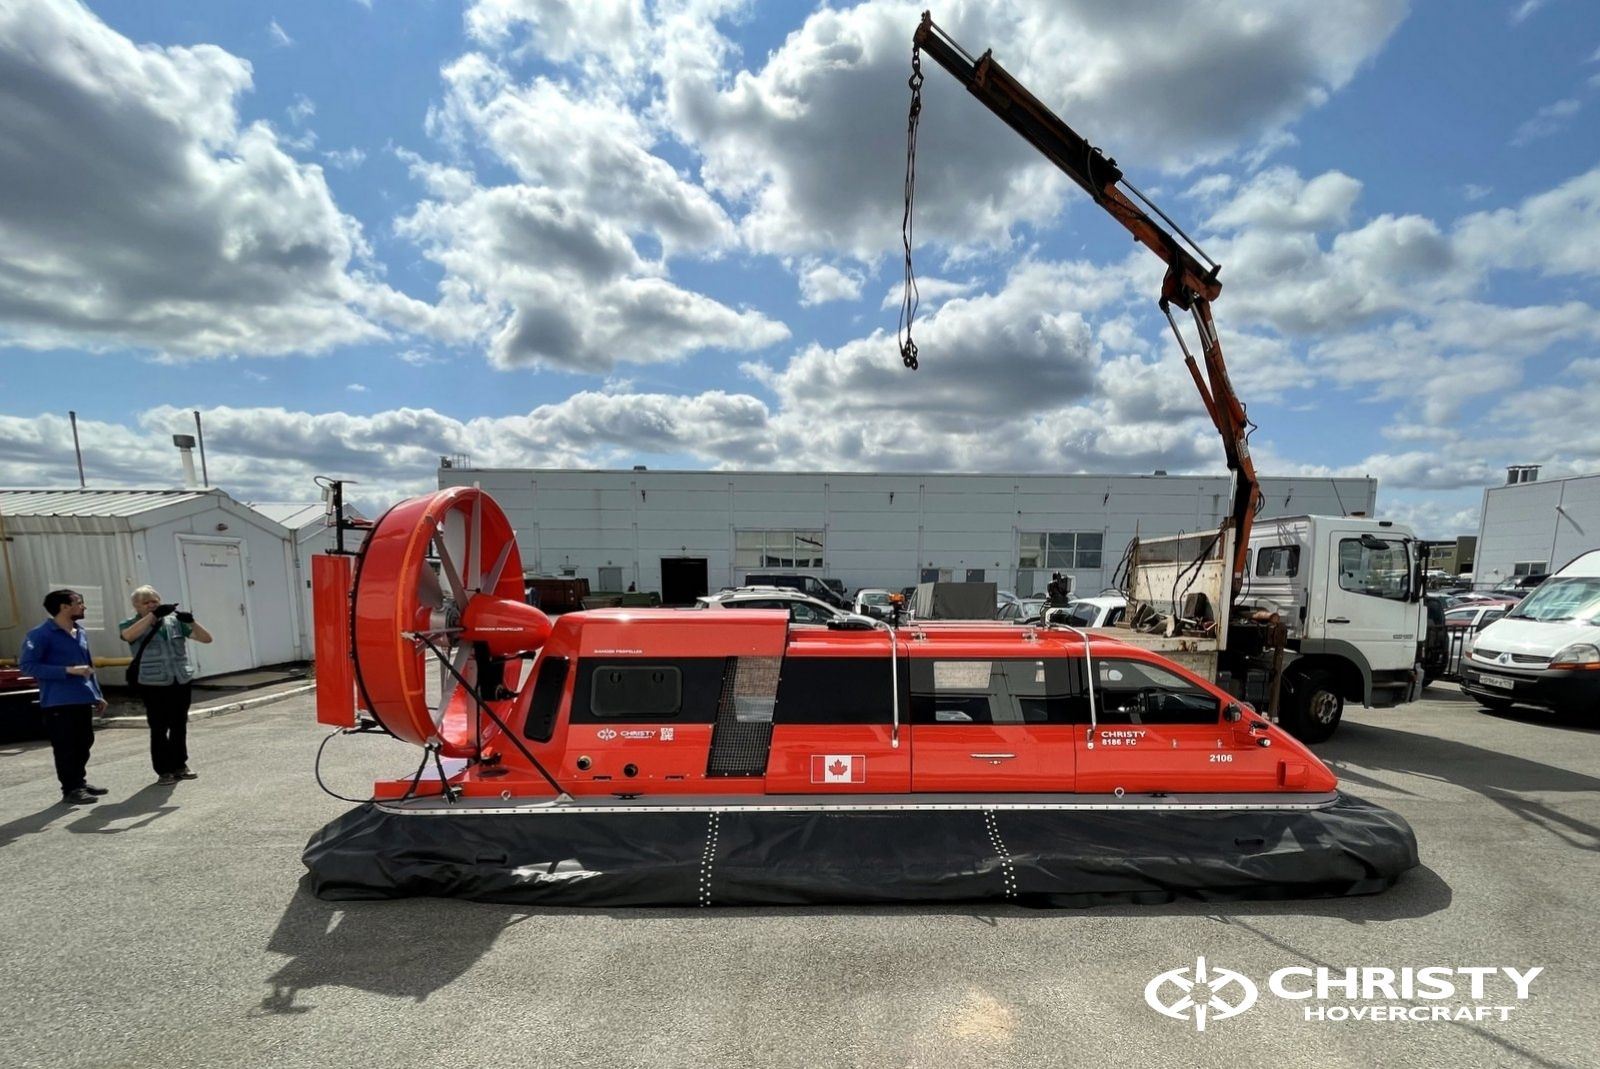 Тест-драйв катера-амфибии Christy 8186 FC Duct для правительства Канады   фото №5